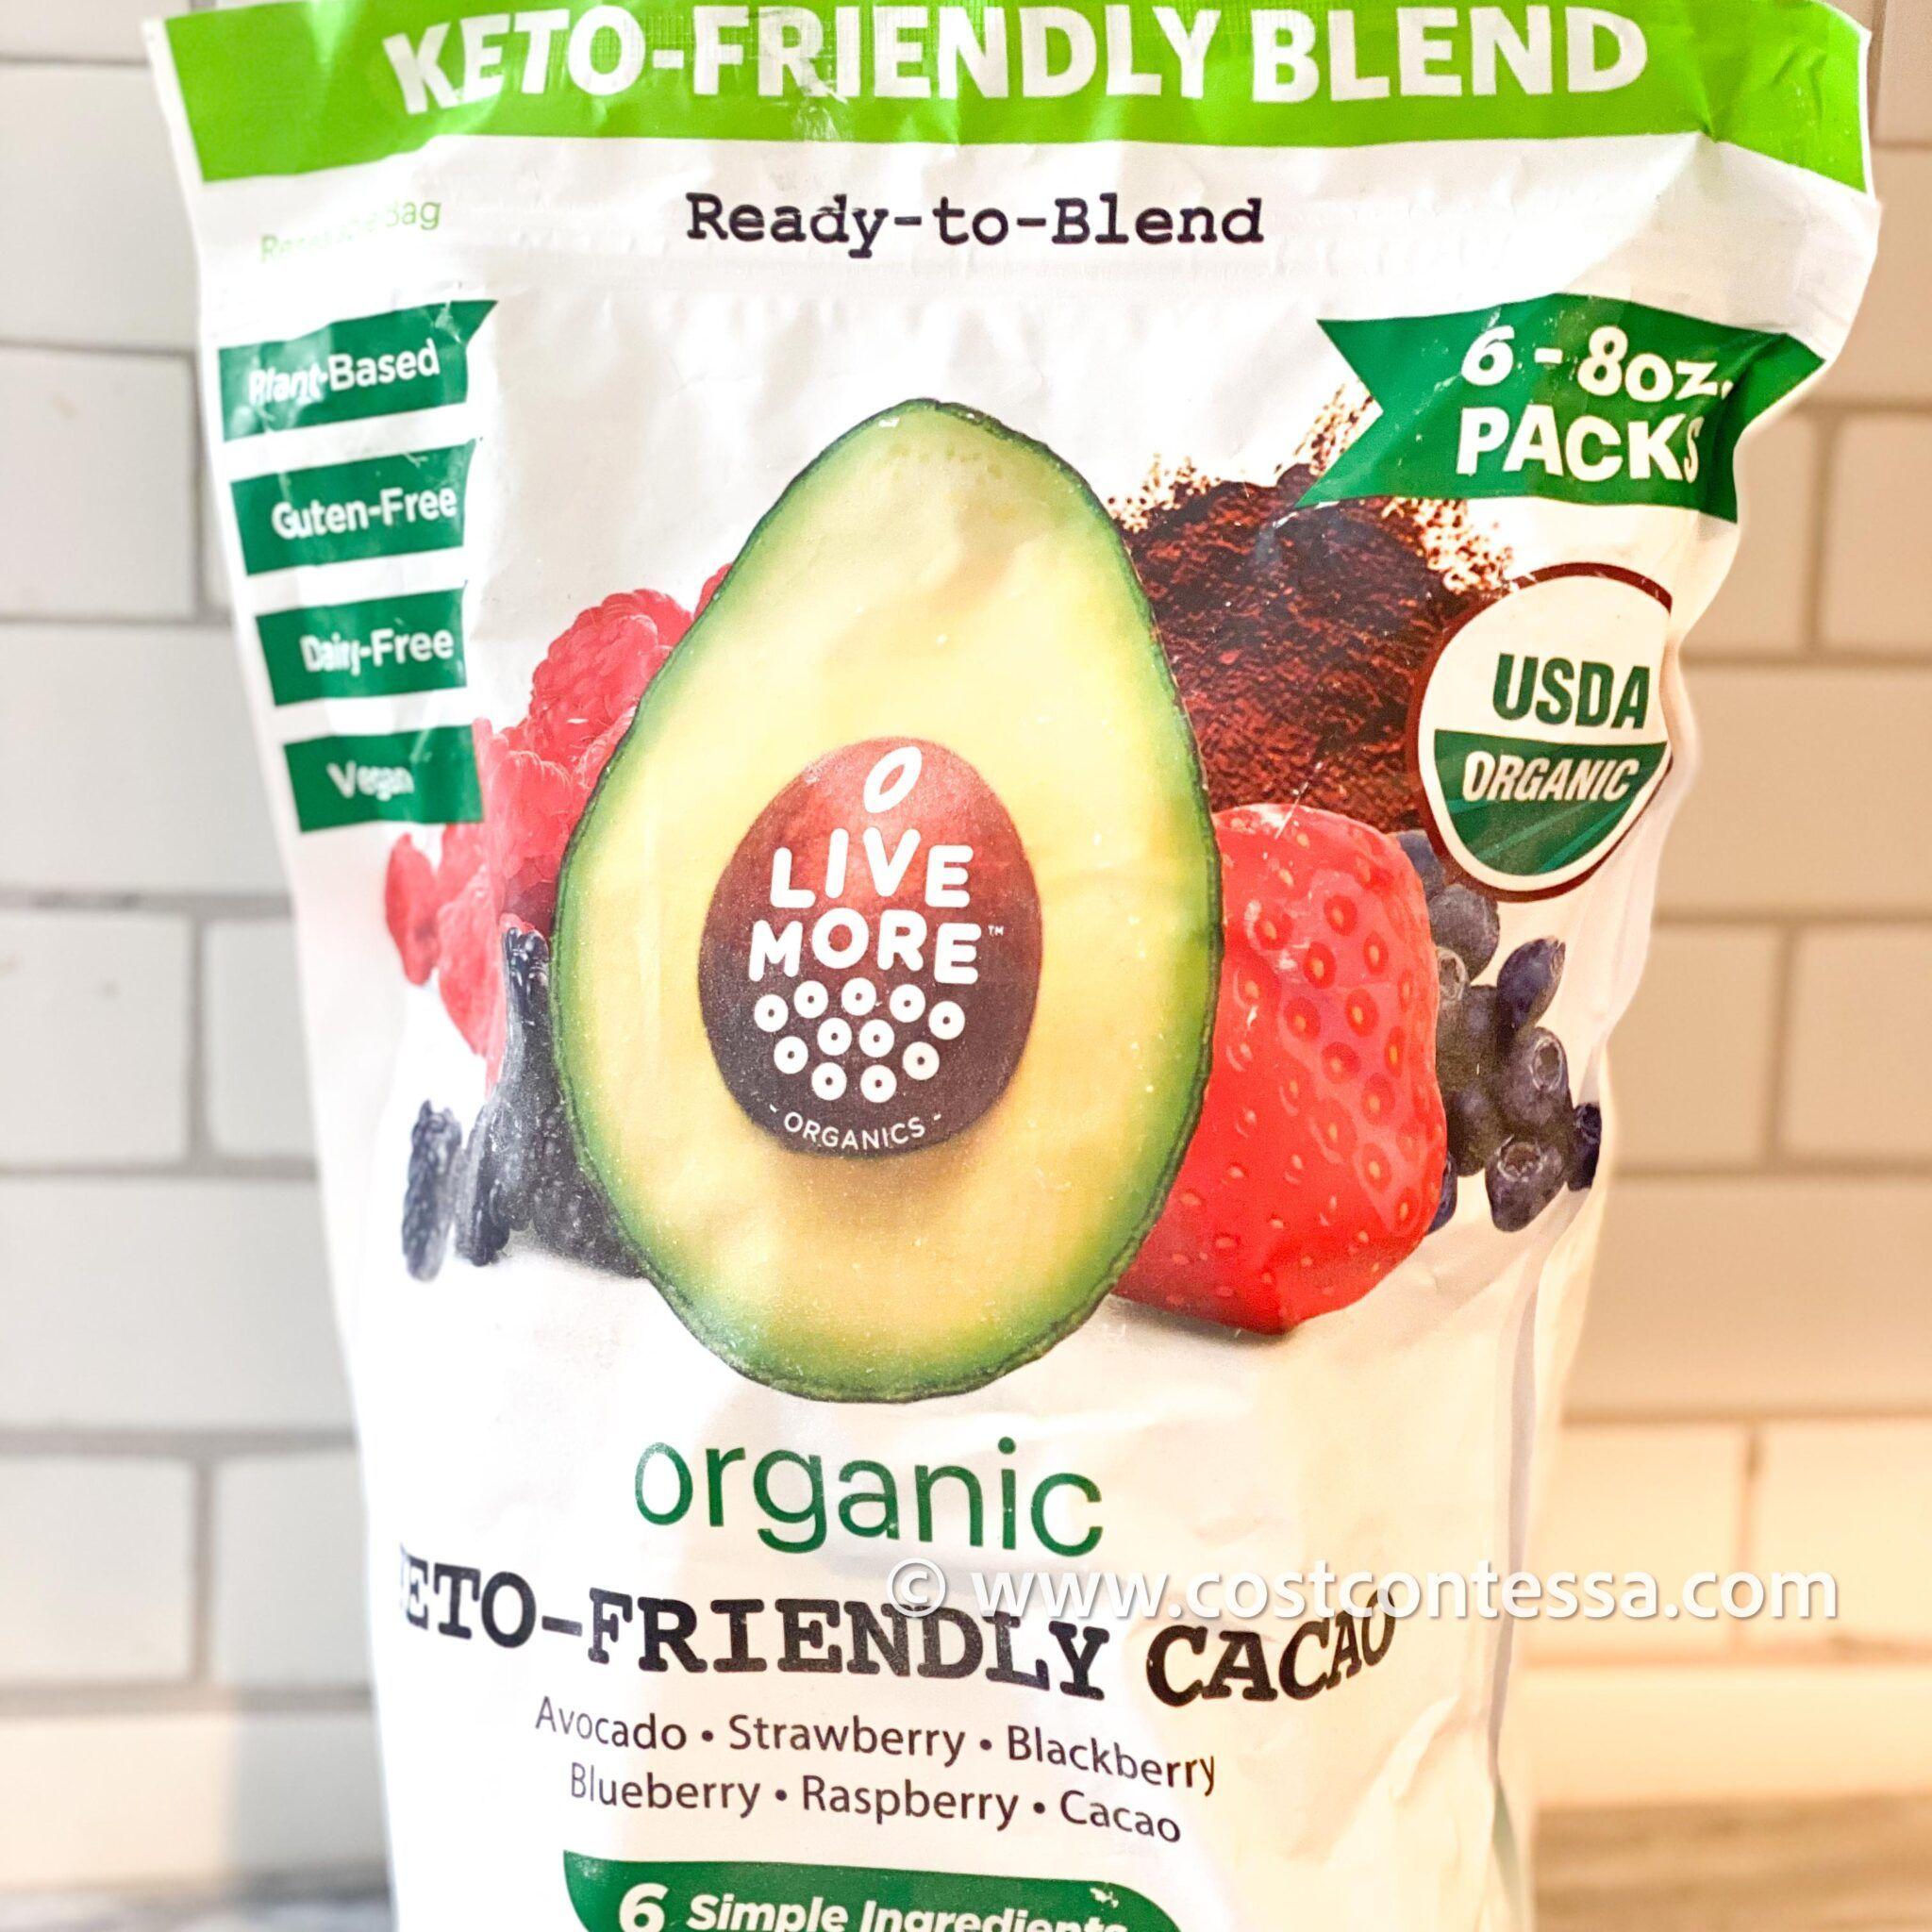 Livemore organics ketofriendly smoothies costco